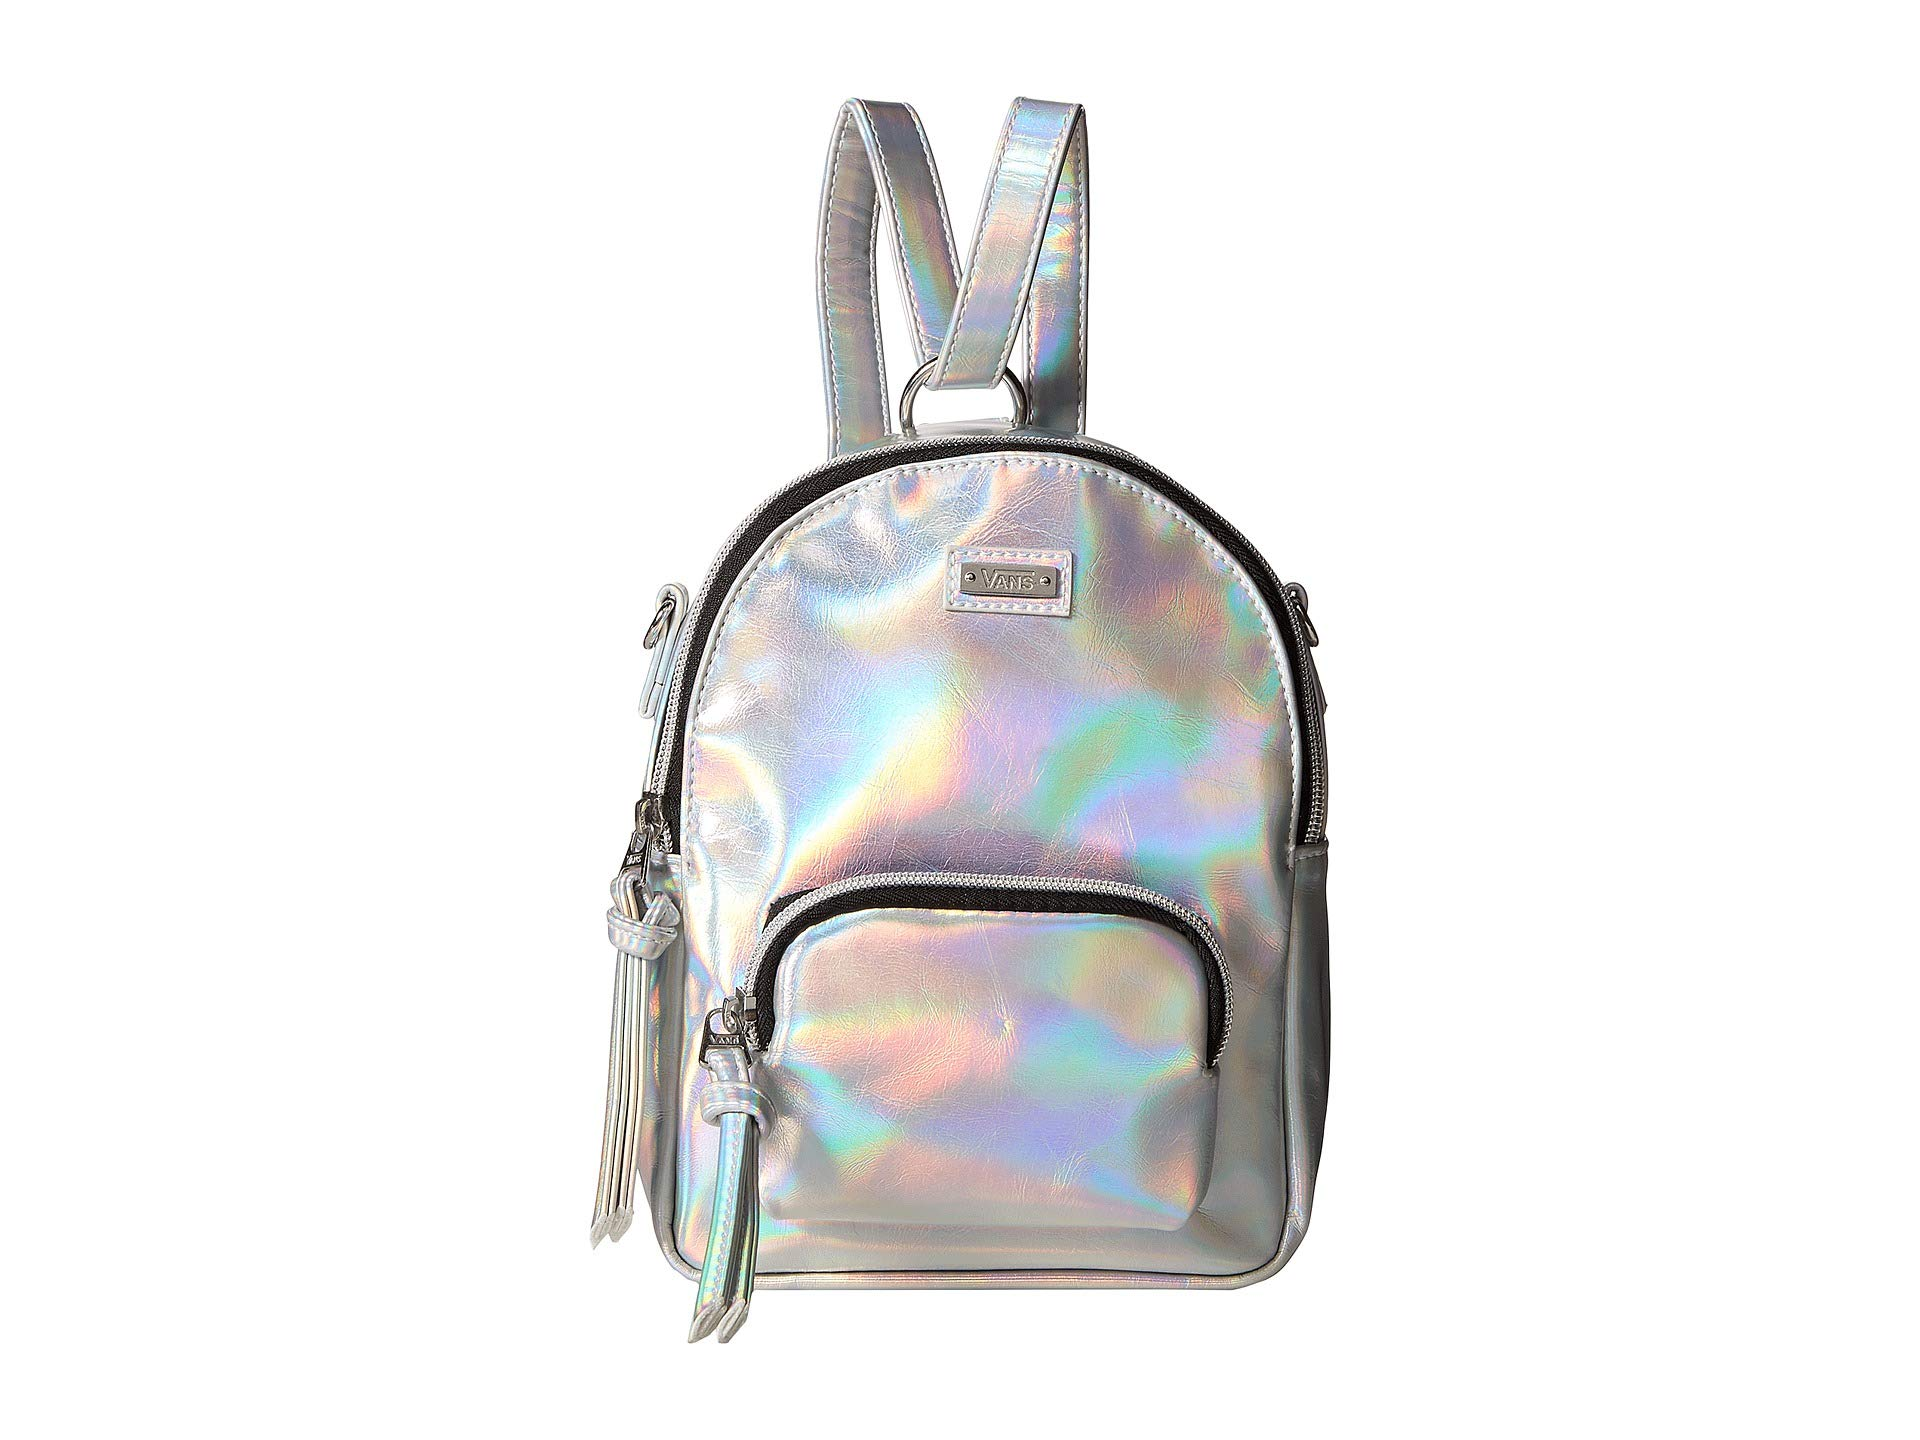 Backpack Mini Vans Two Timing Iridescent Rainbow xqOYSYgv